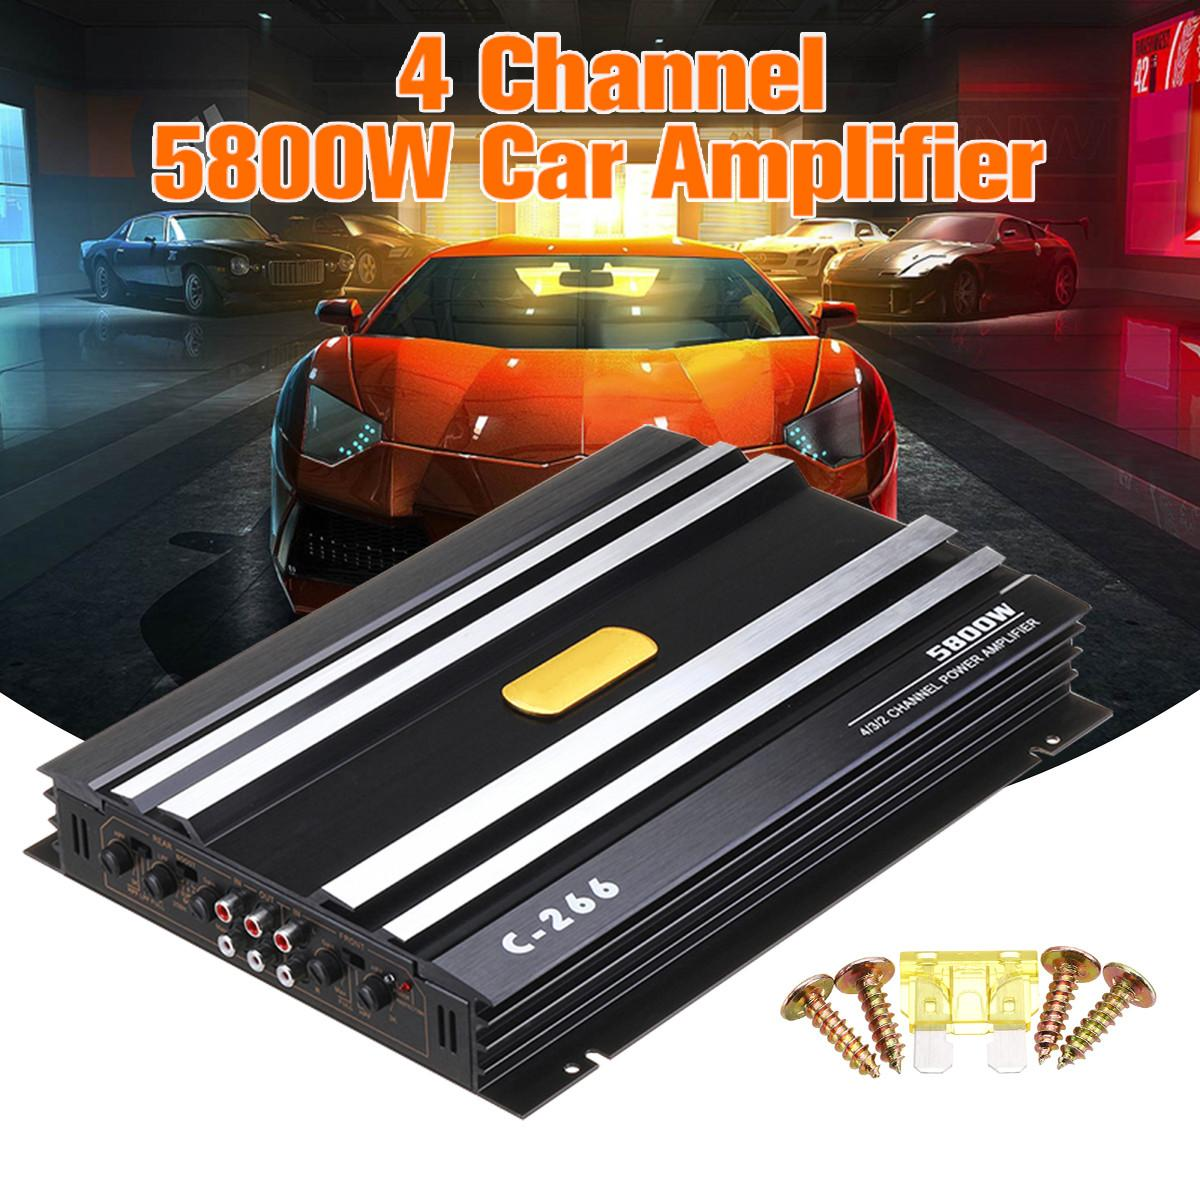 5800 Watt 4 Channel 12V Car Amplifer Car Audio Power AmplifierCar Audio Amplifier for Cars Amplifier Subwoofer